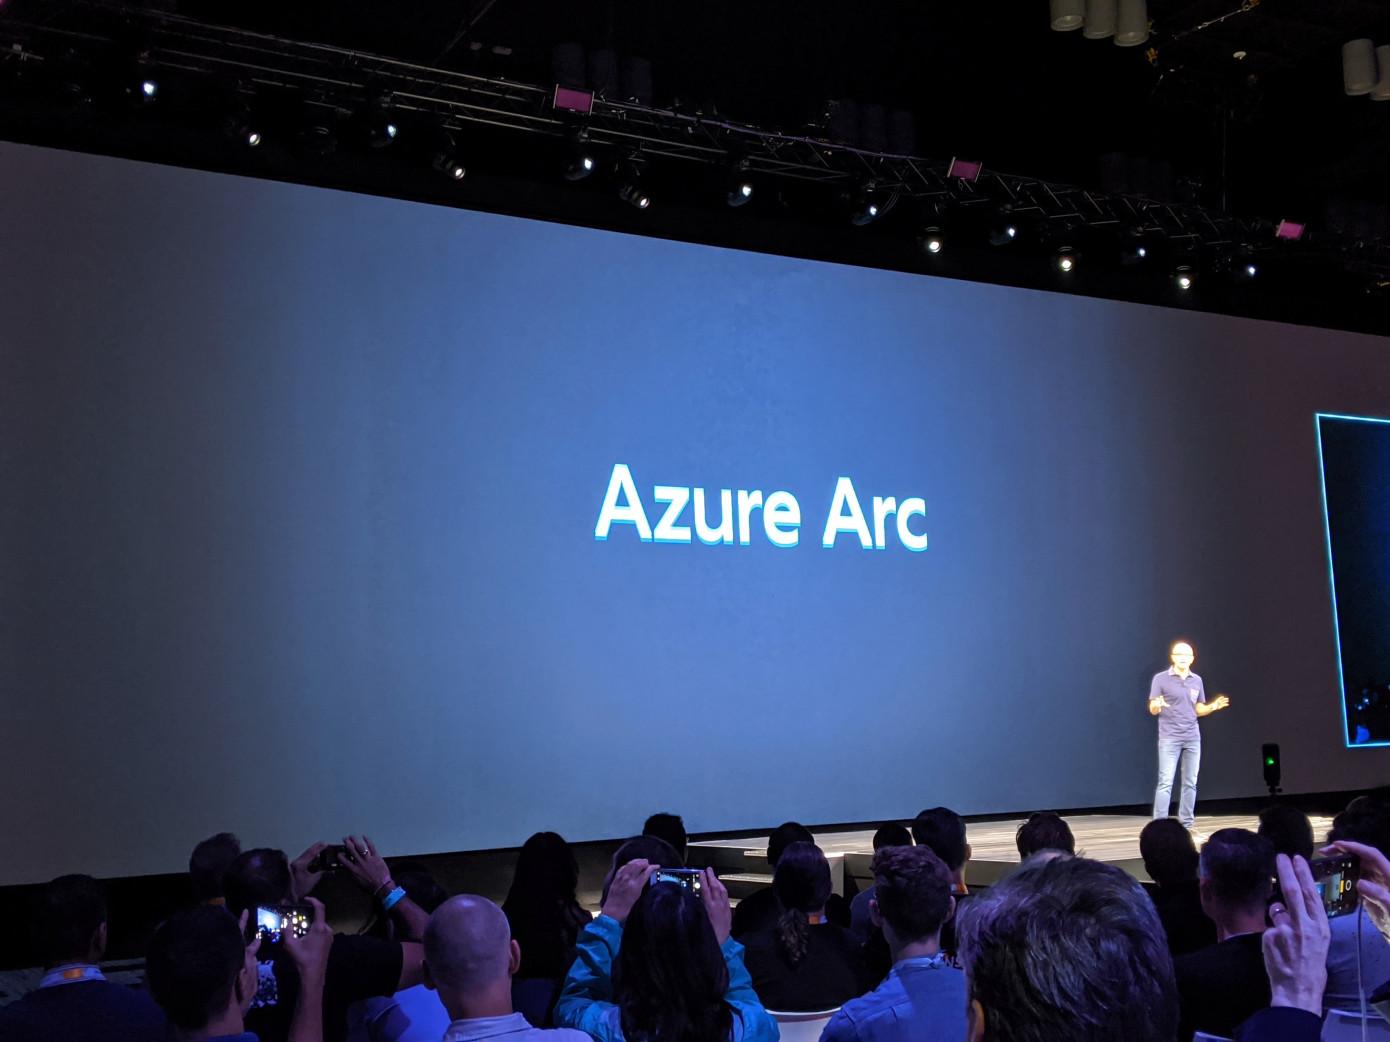 خدمة Azure Arc